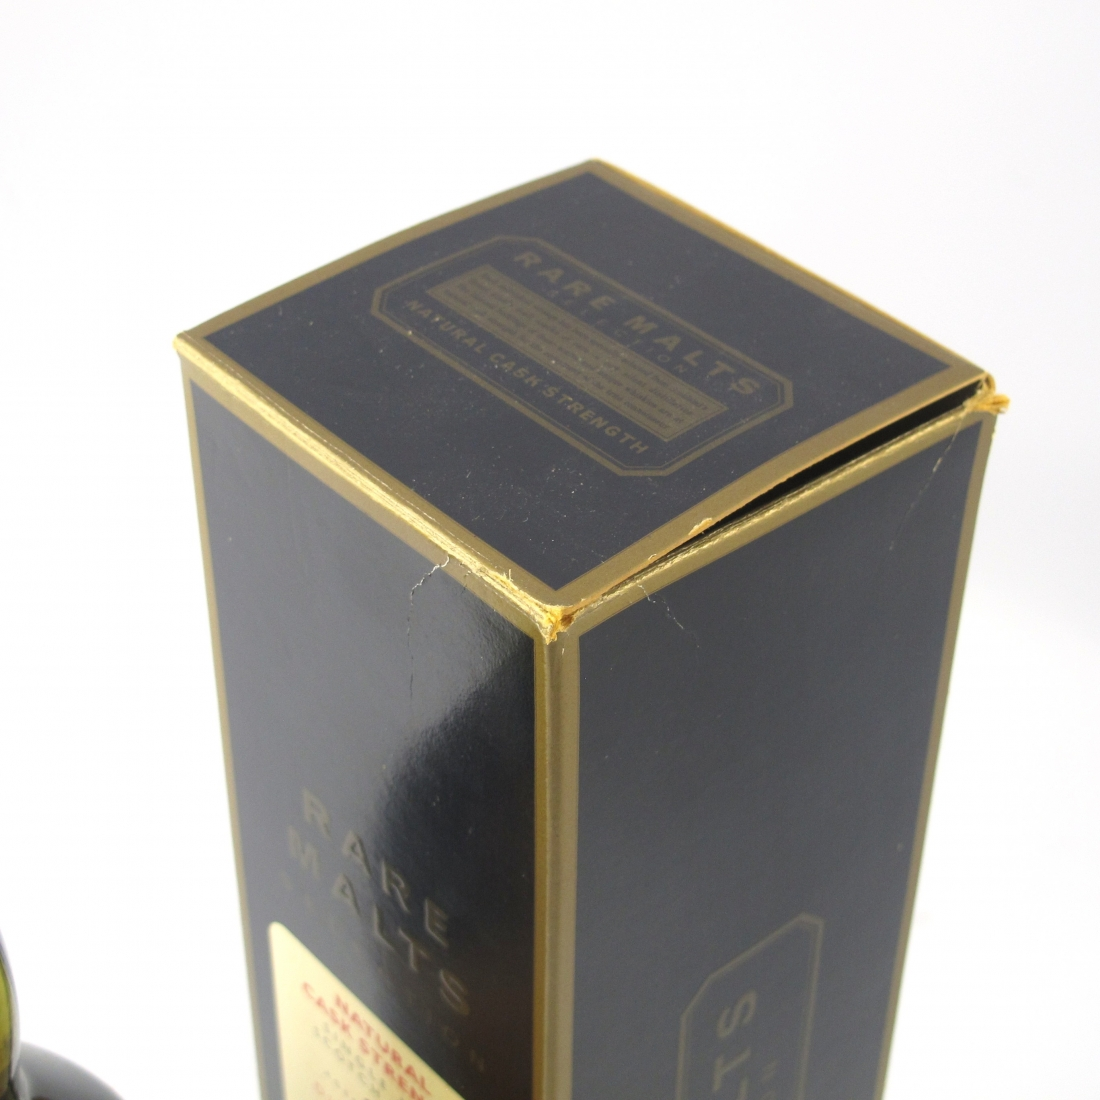 Royal Brackla 1978 Rare Malt 20 Year Old / 59.8%